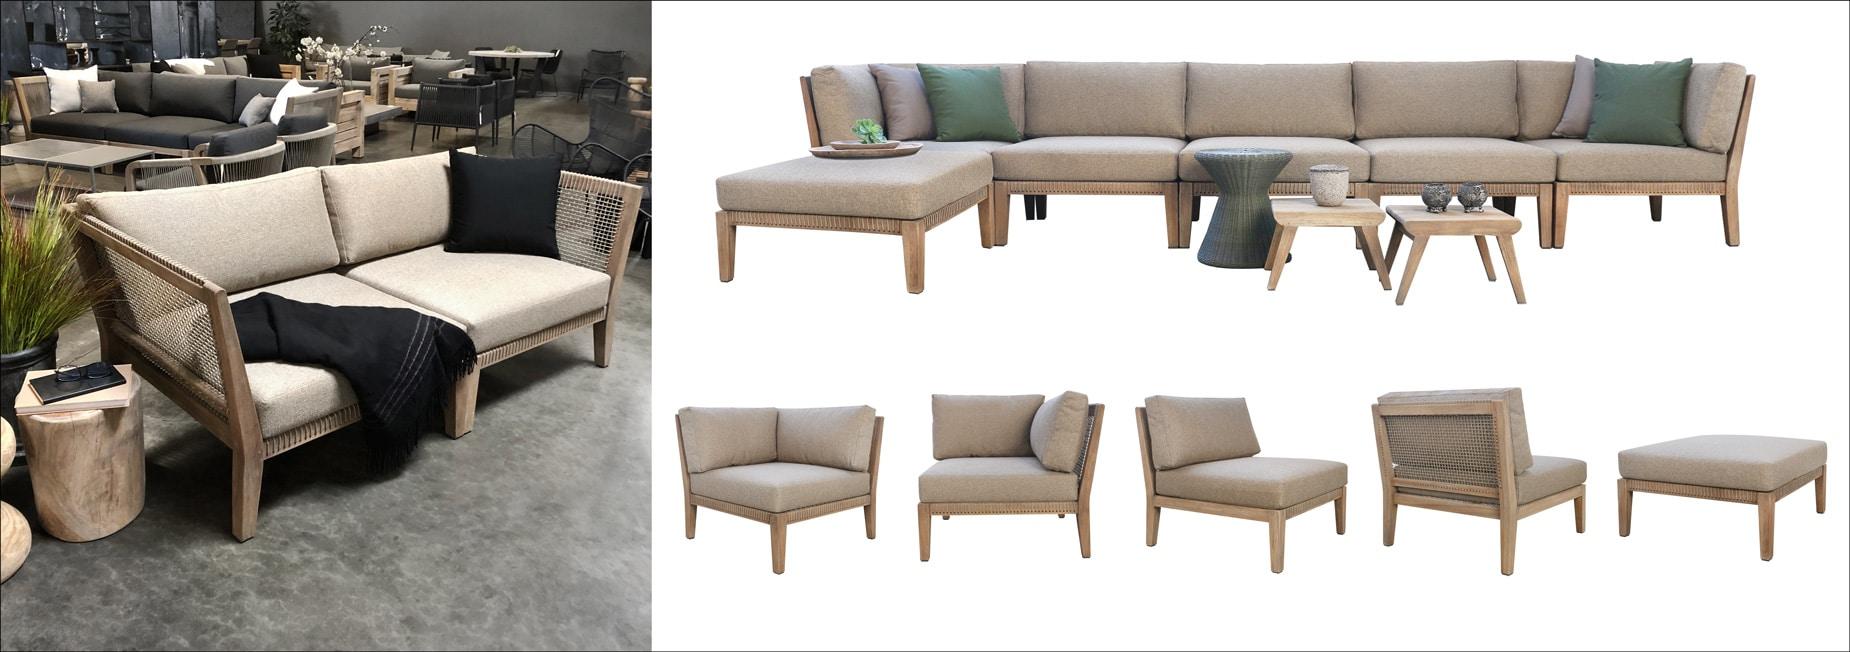 Gazzoni Teak Furniture Collection